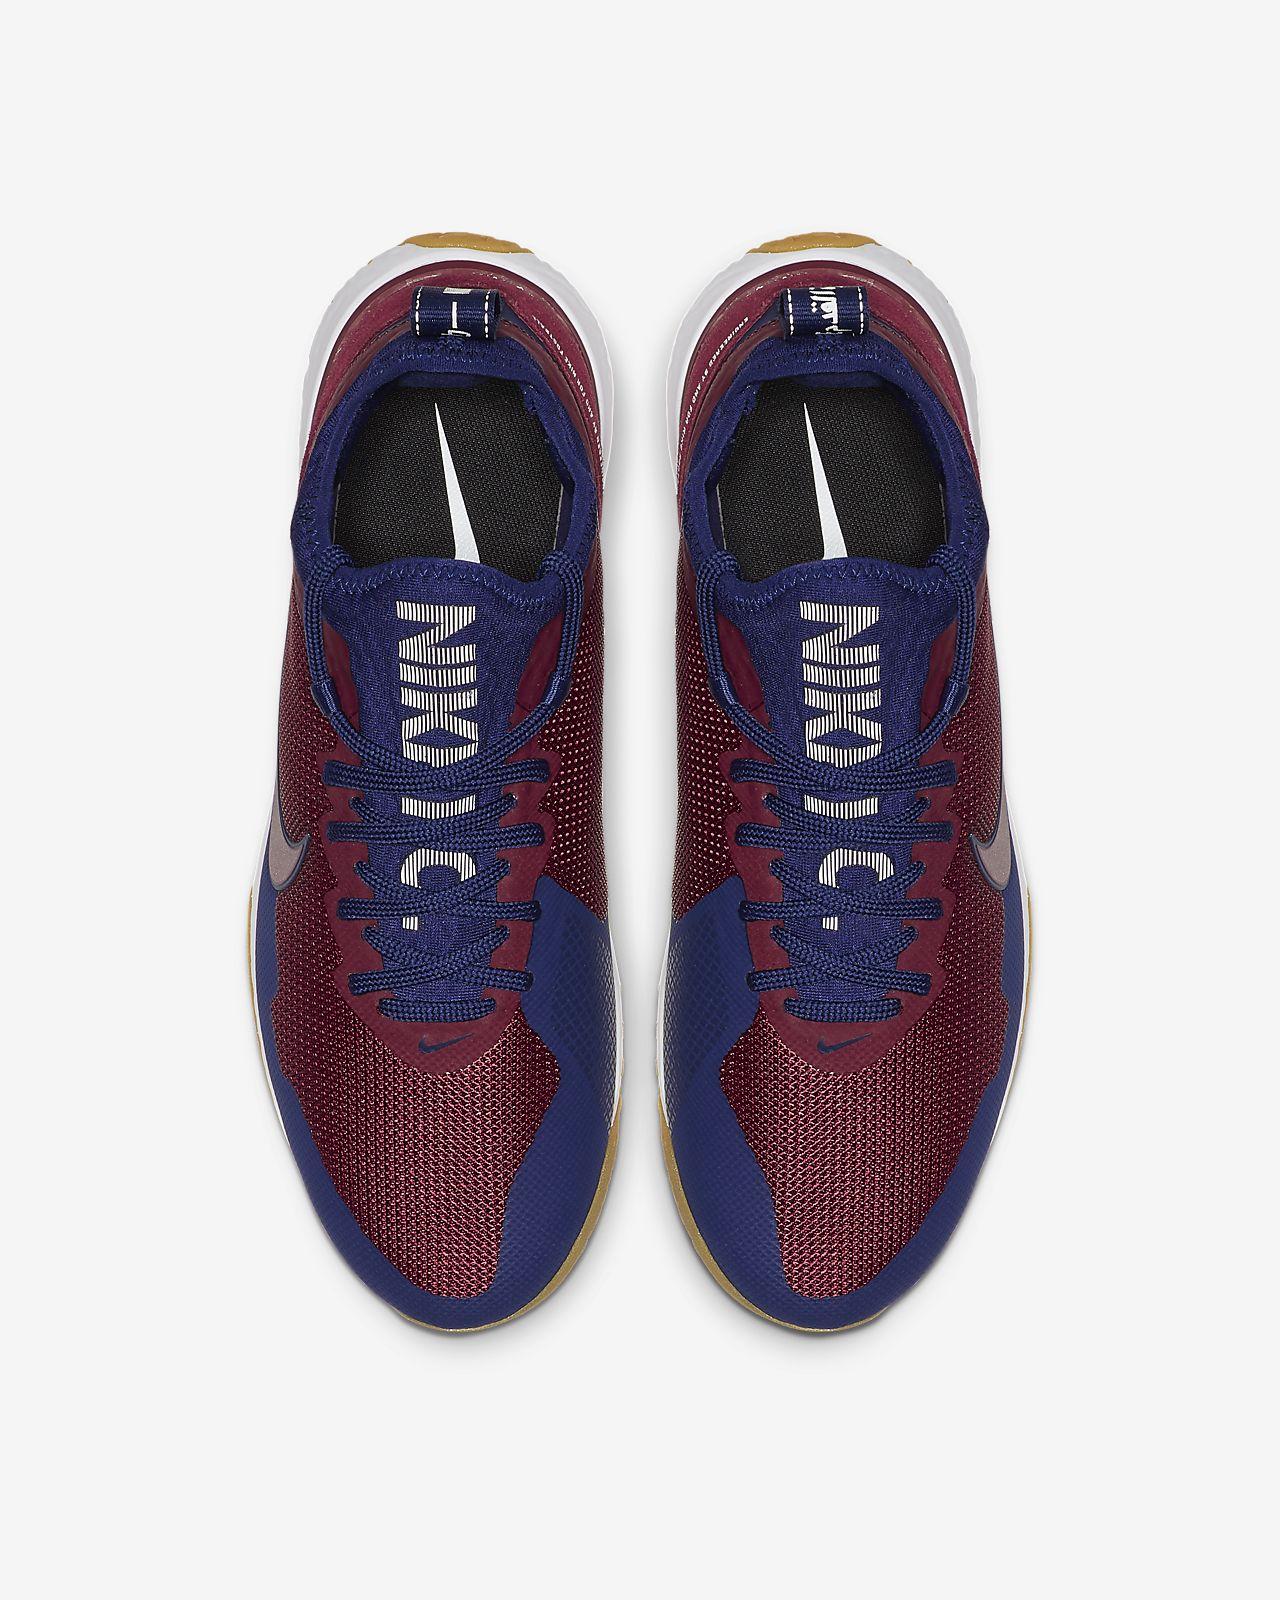 8fd91fb3ece Low Resolution Nike F.C. Football Shoe Nike F.C. Football Shoe